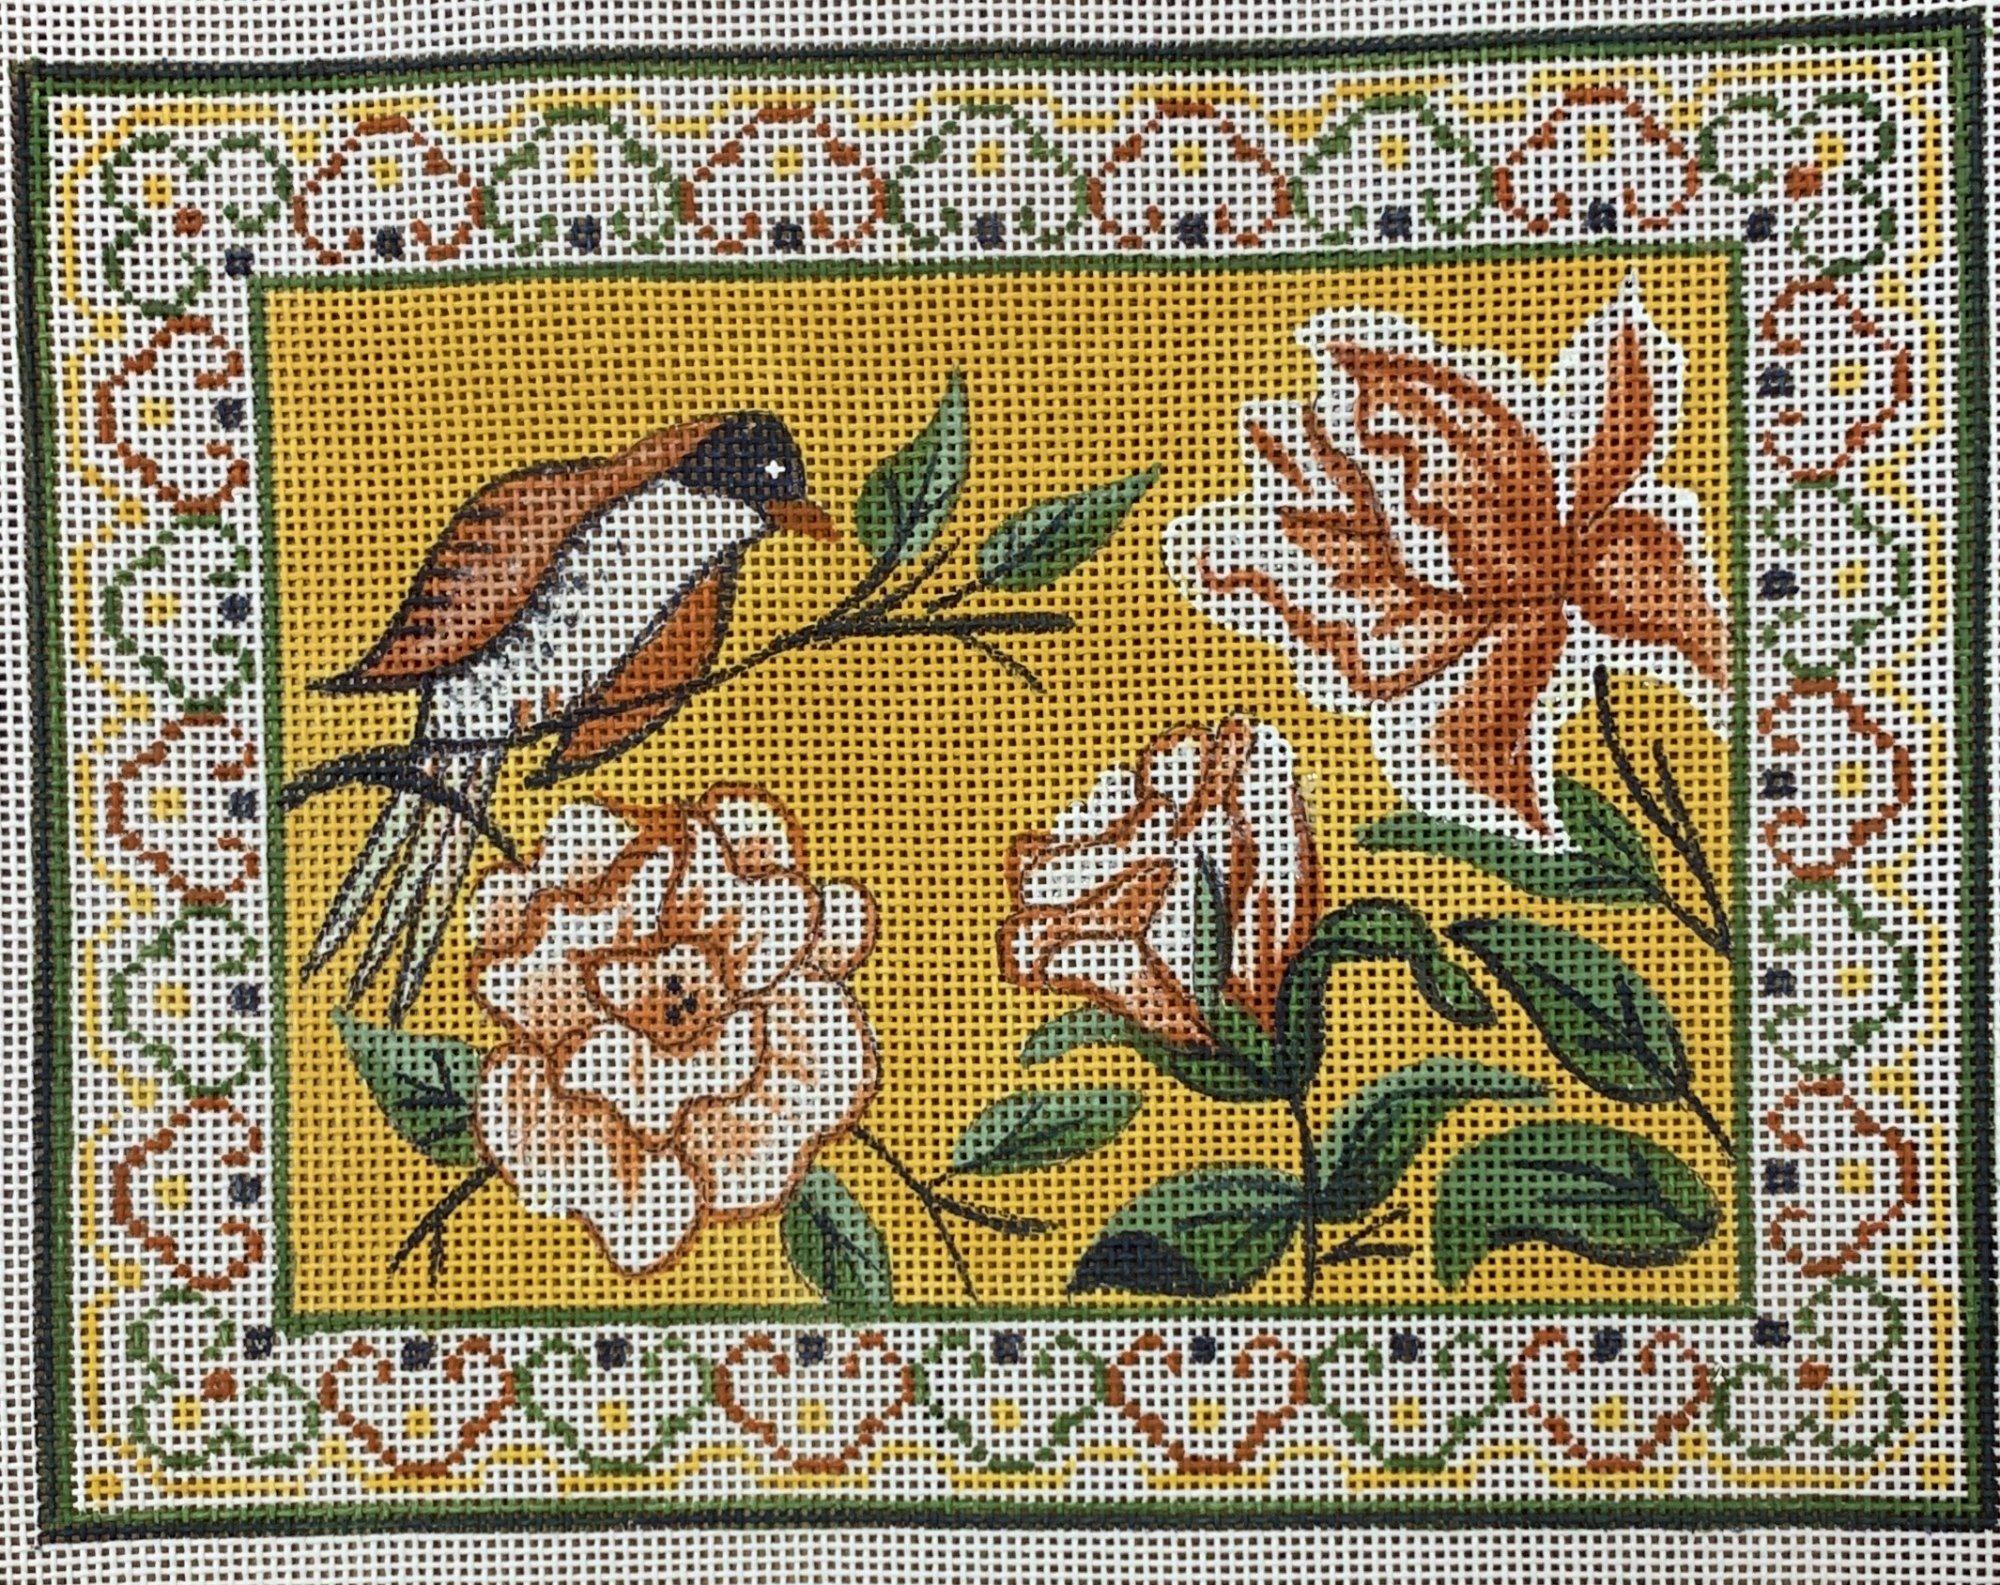 Finch & Flower Mah Jongg